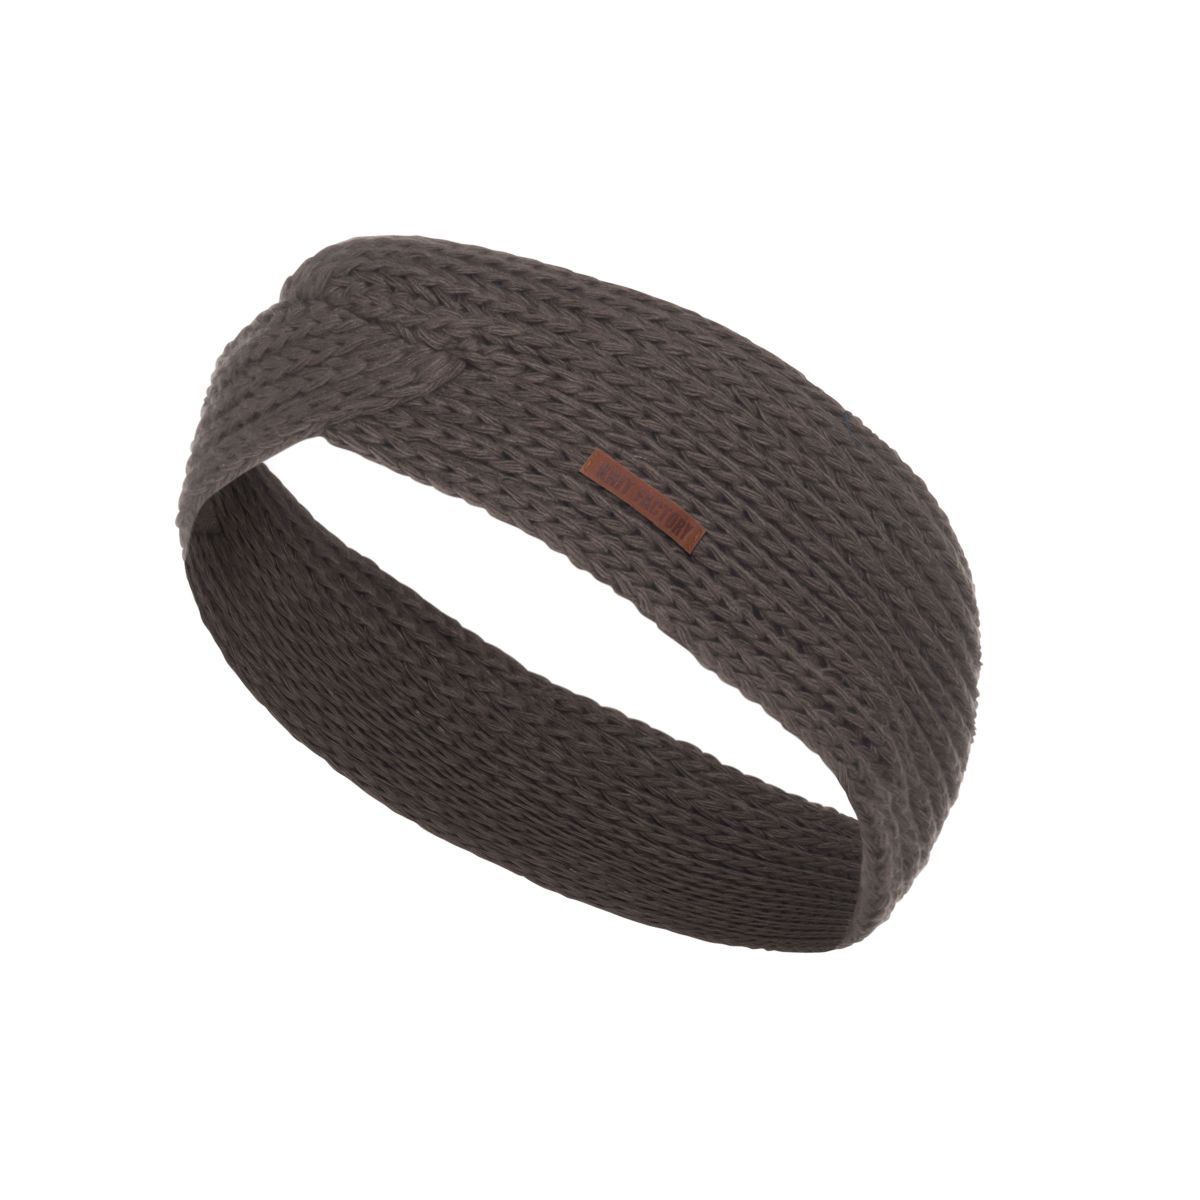 knit factory 1376929 joy hoofdband taupe 1